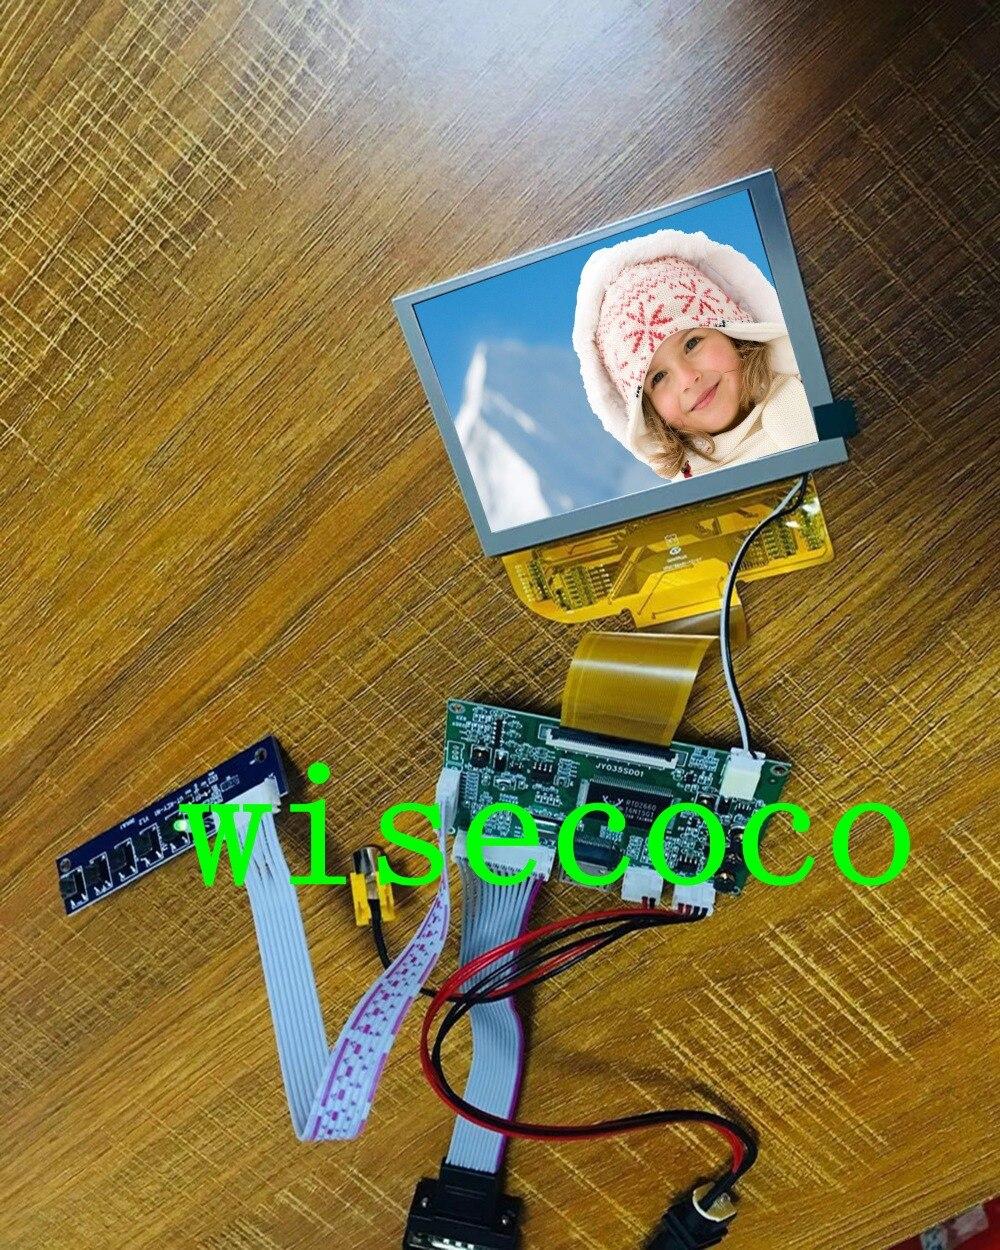 3.5 polegada 800x600 Painel Lcd com HDMI AV VGA Placa do Drive